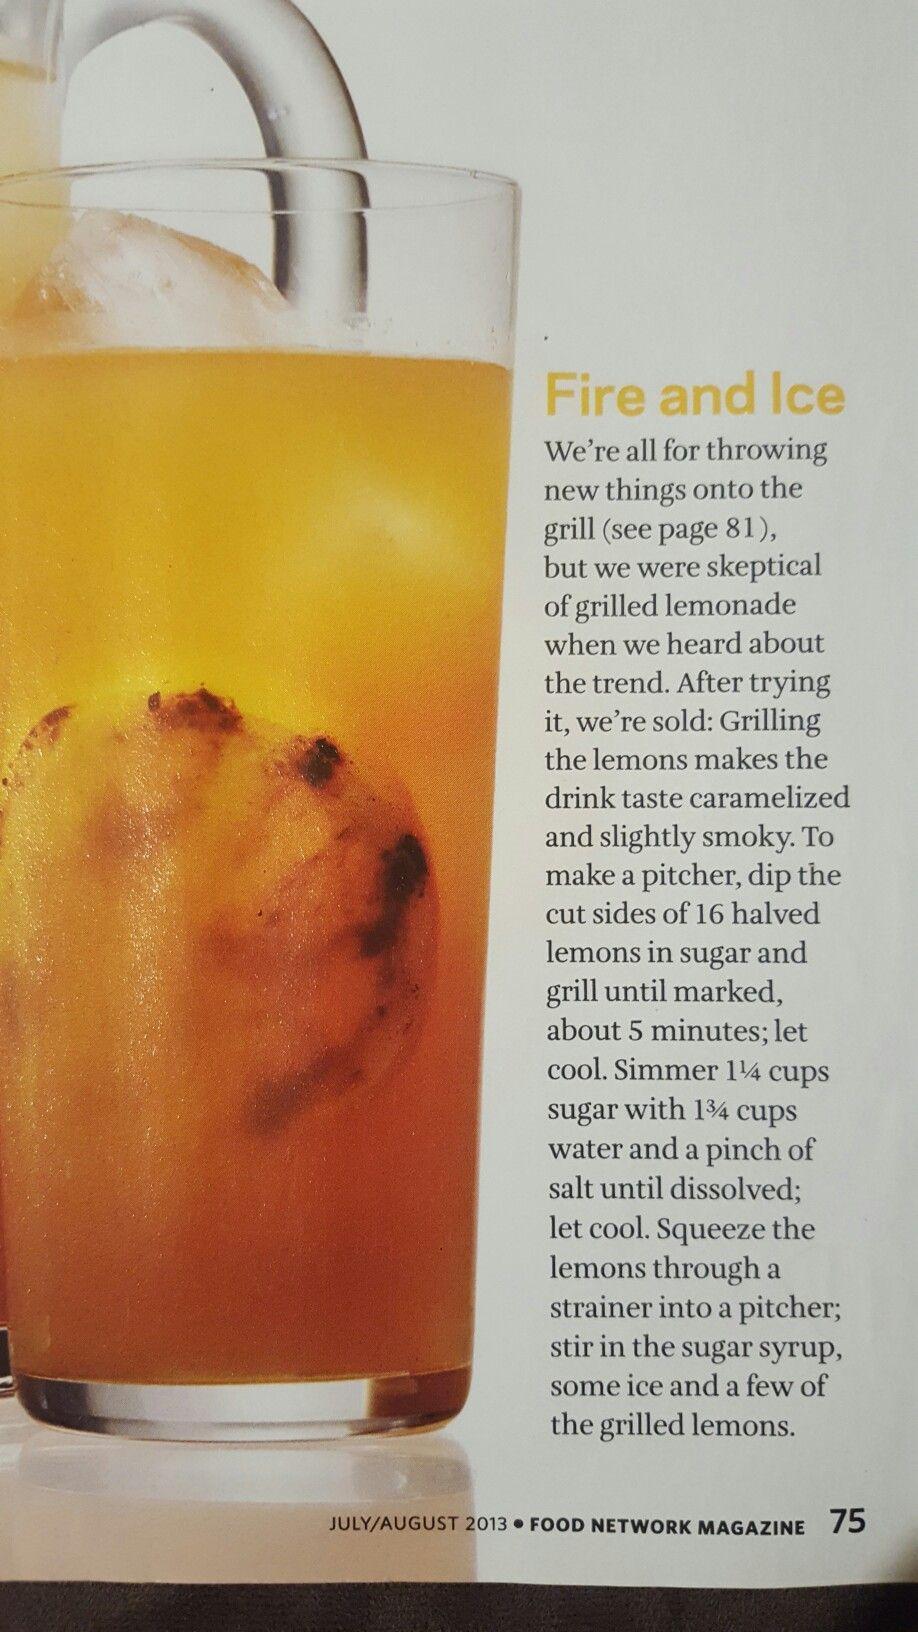 Grilled lemonade